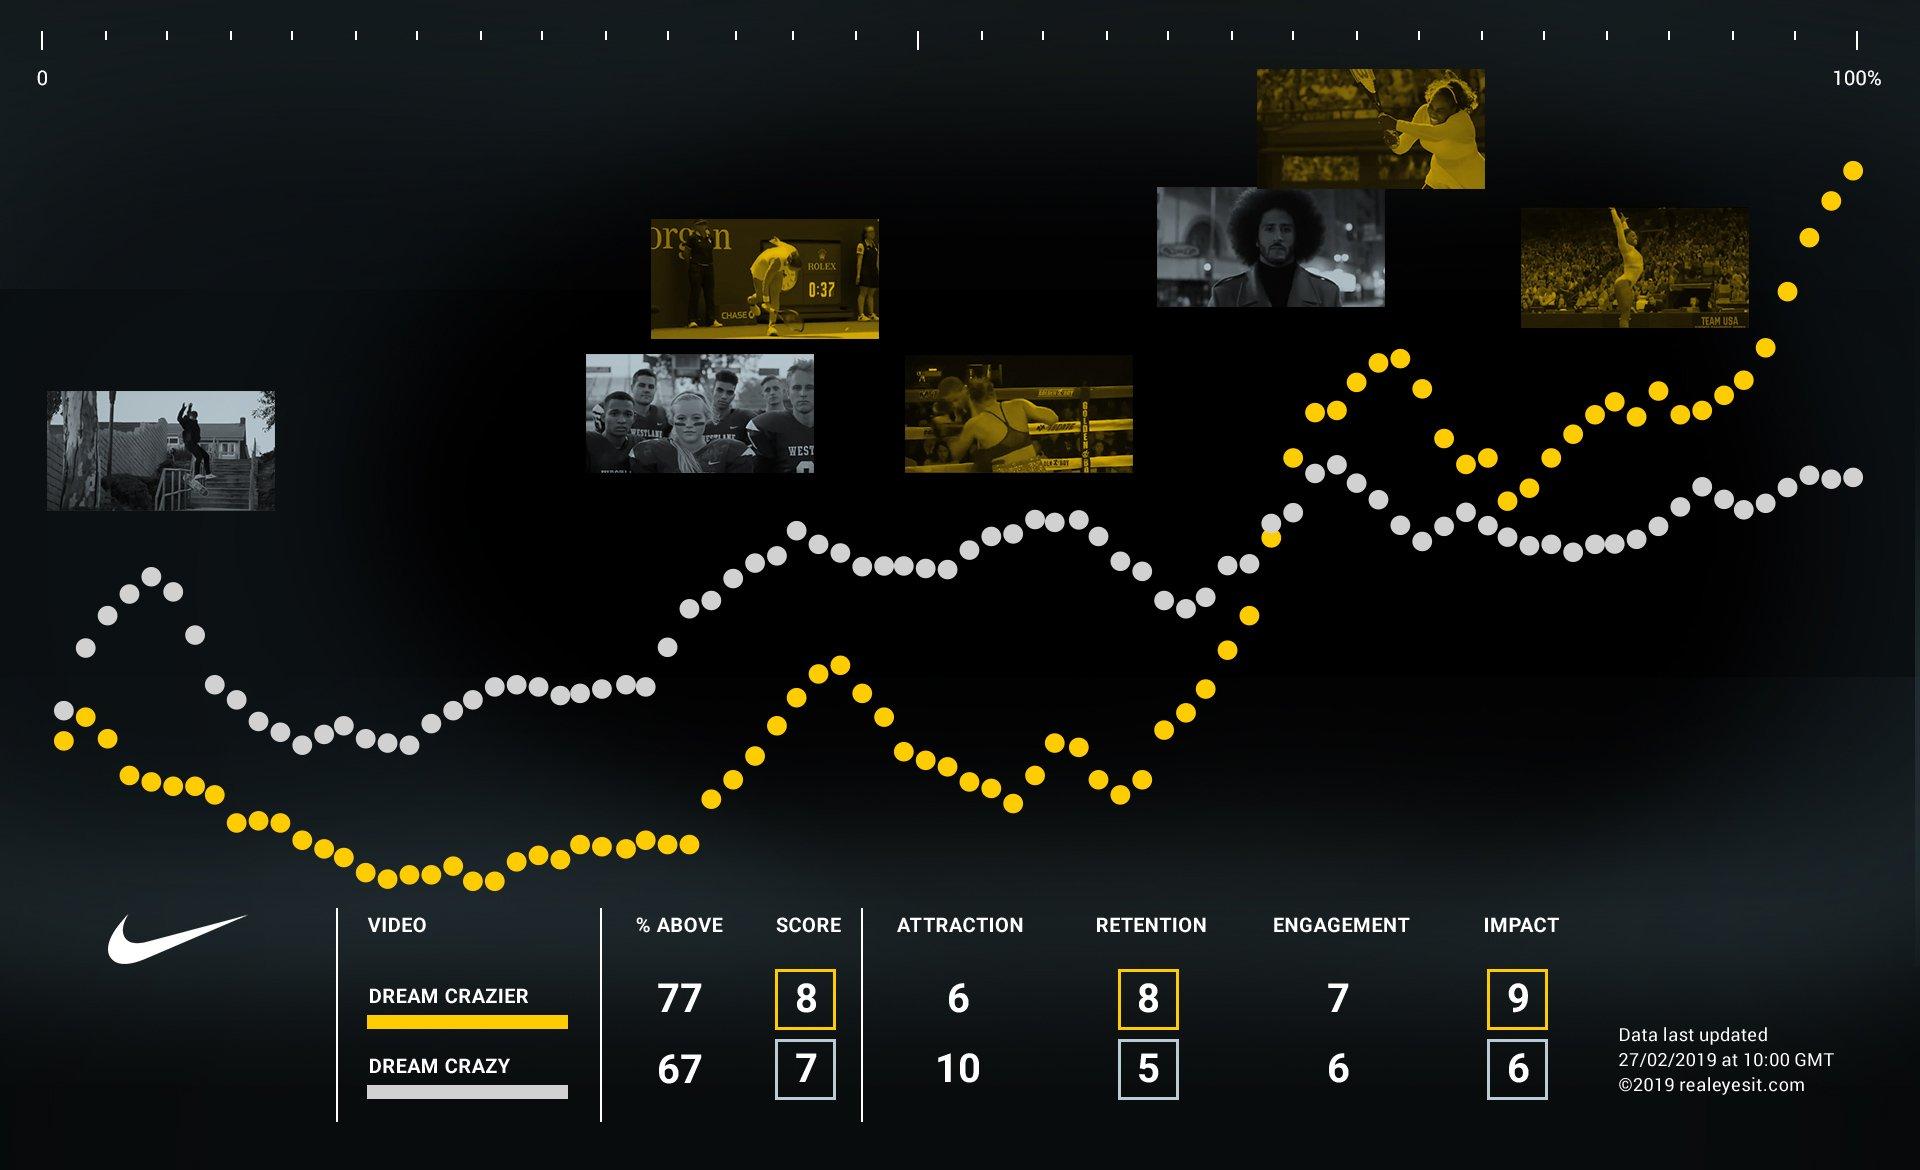 Nike_Positivity_Comparison